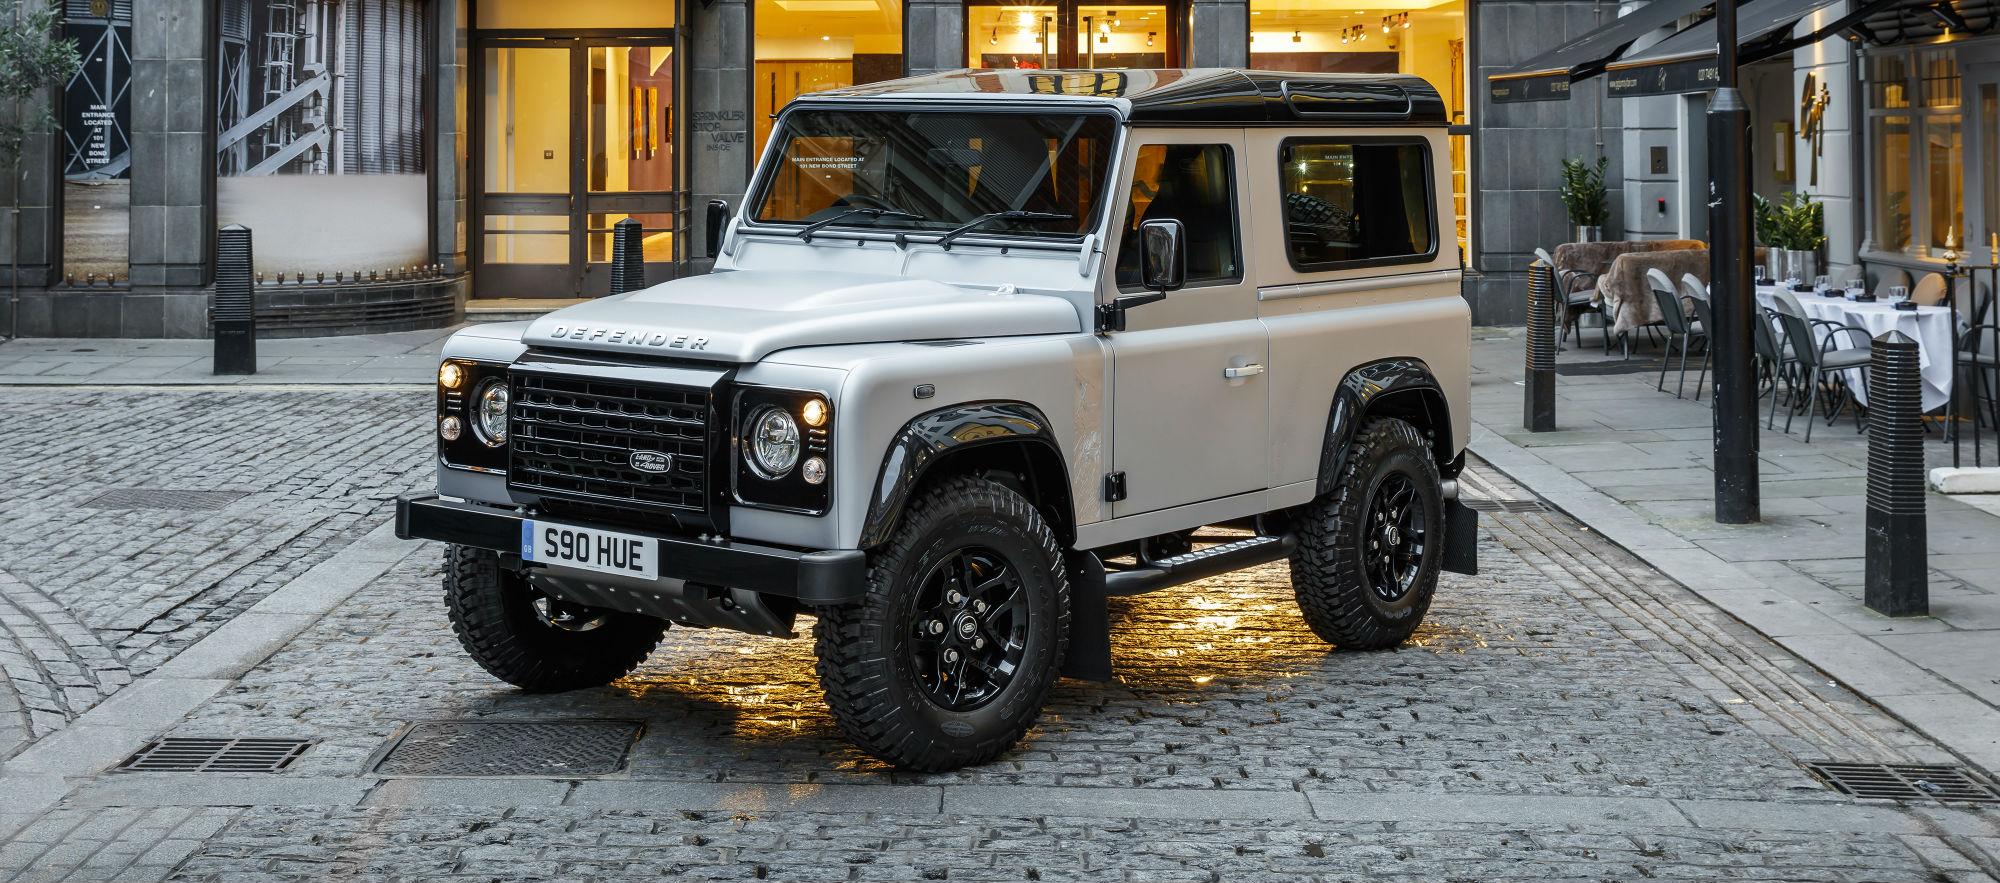 Land Rover Show That You Care For The Defender Jaguar Forums Op Ed